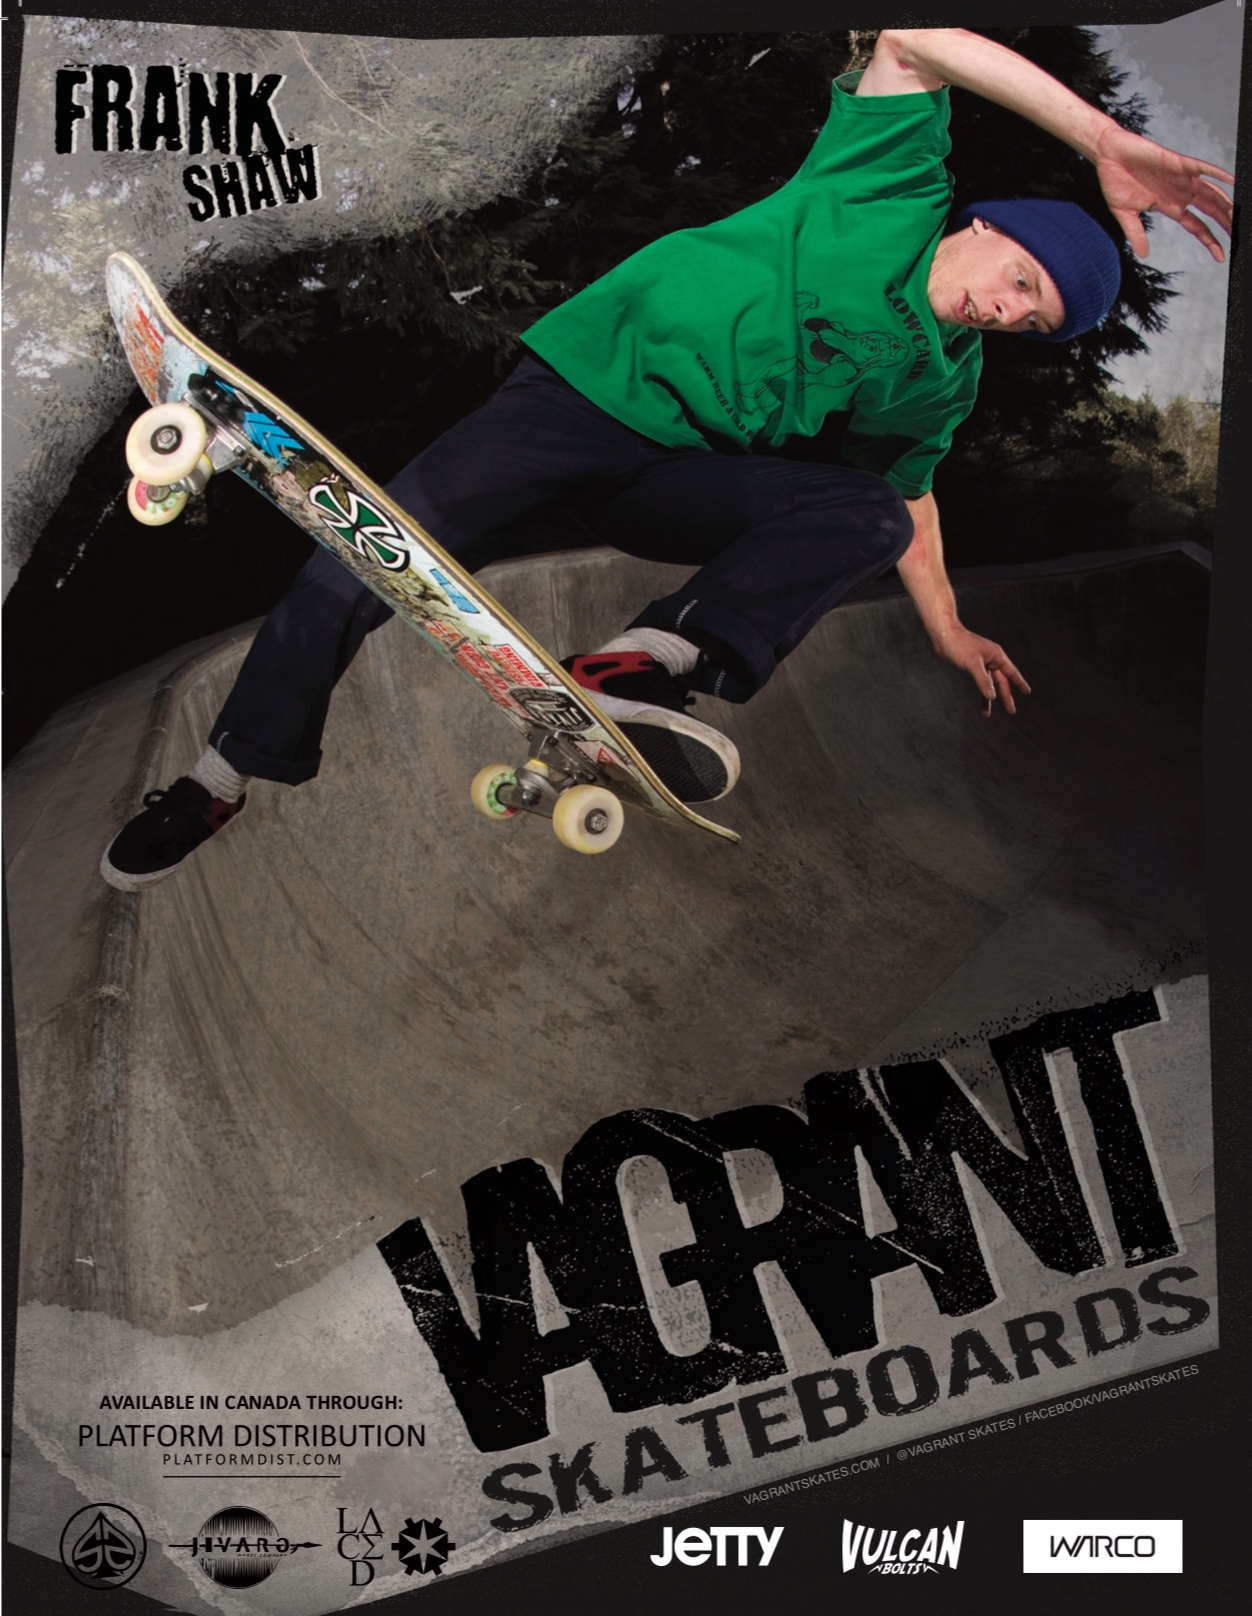 Vagrant Skateboards ad in Concrete Magazine